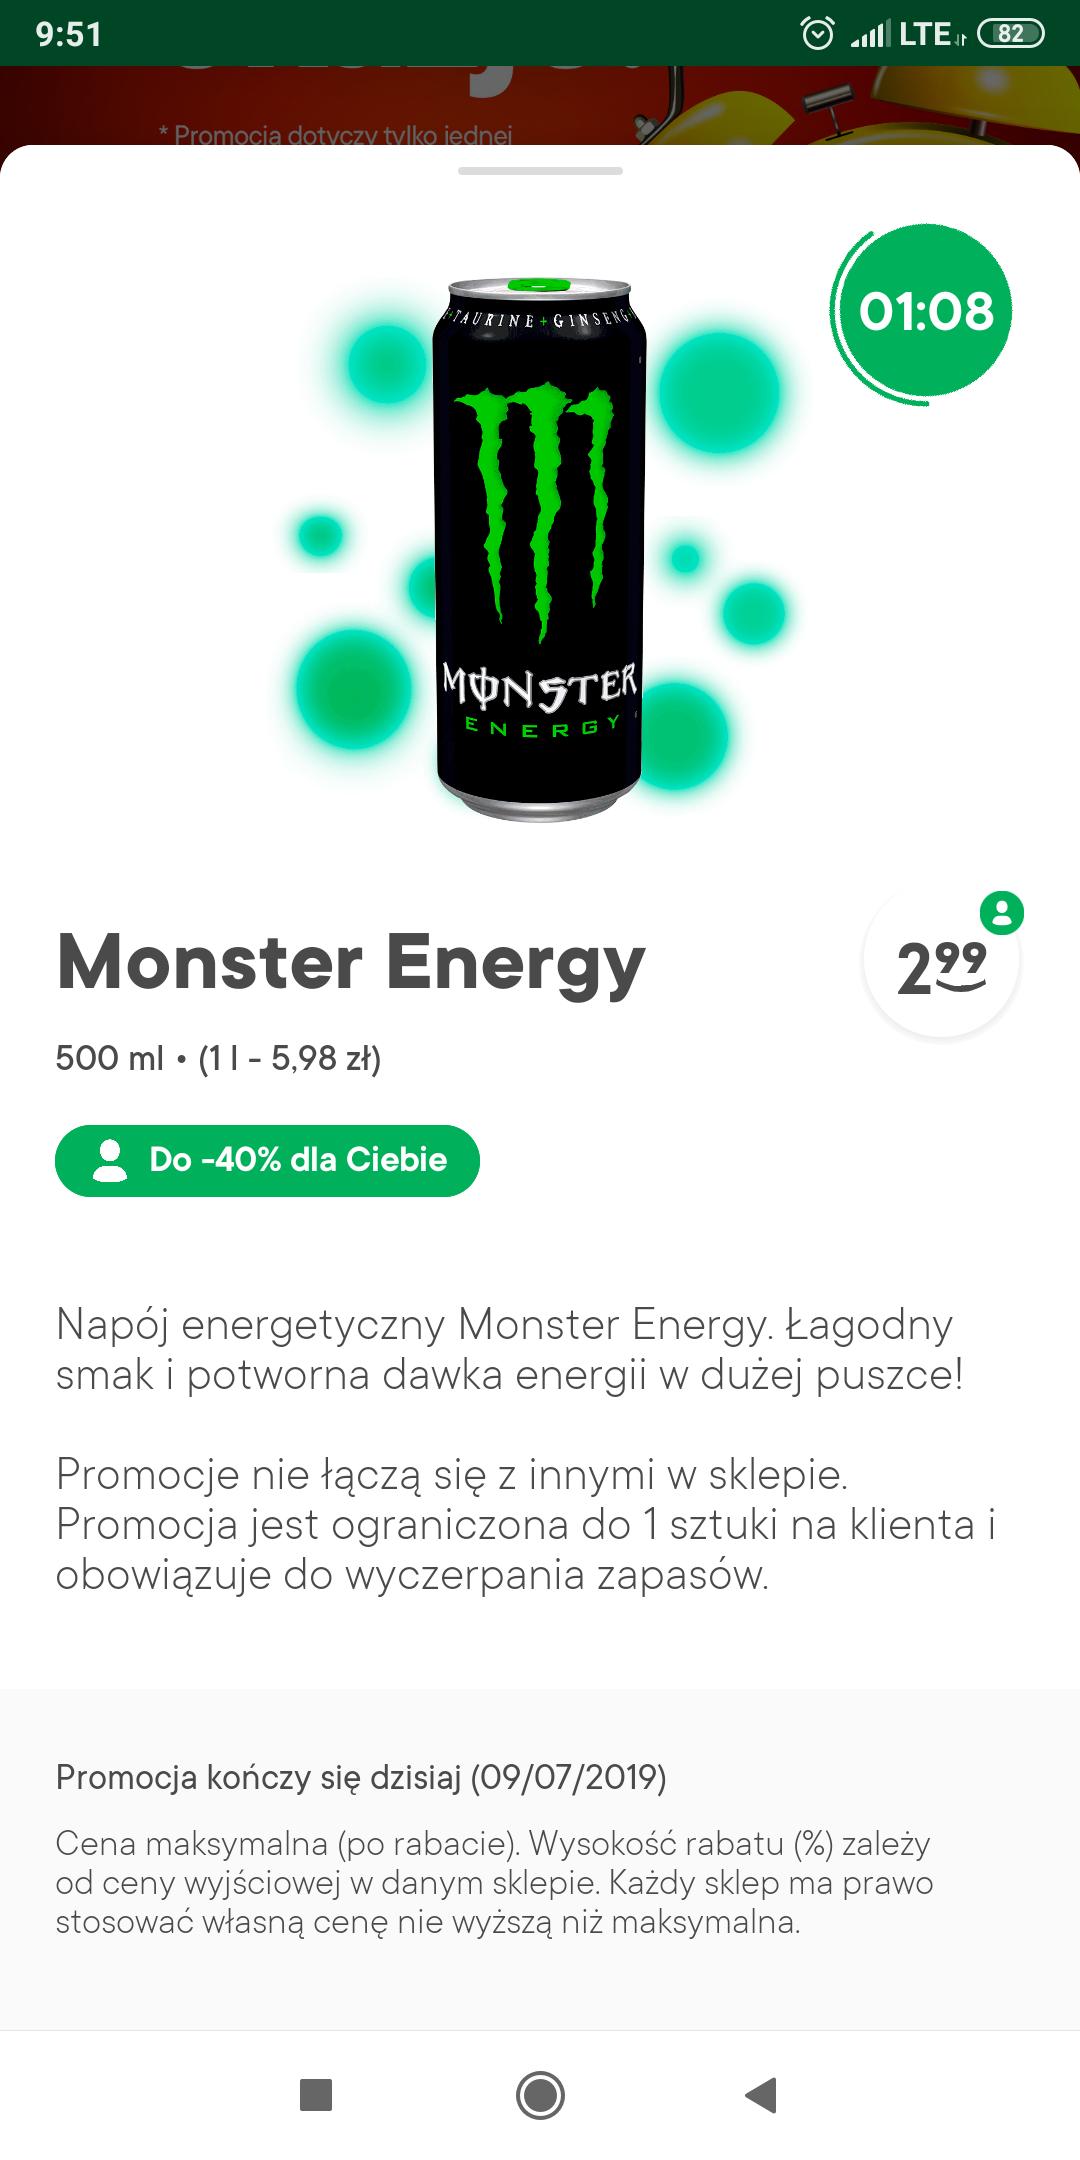 Monster Energy Drink Żabka - cena z aplikacją Żappka